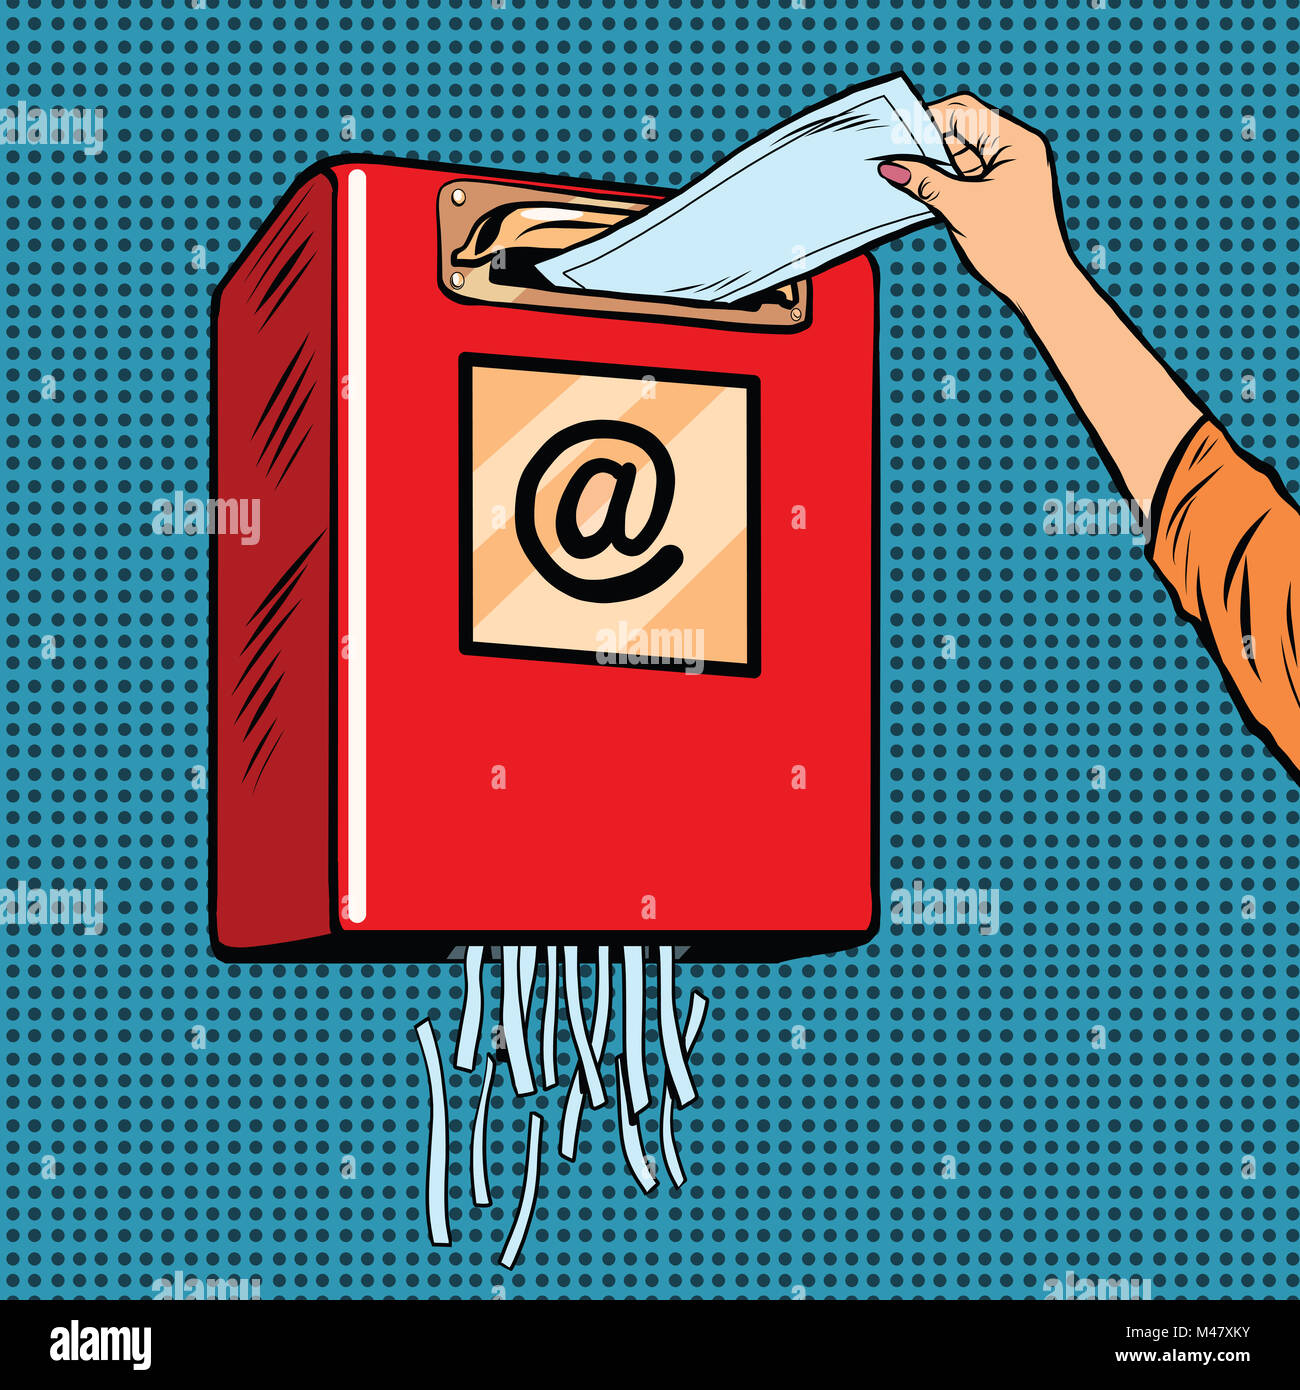 Spam trash junk email - Stock Image